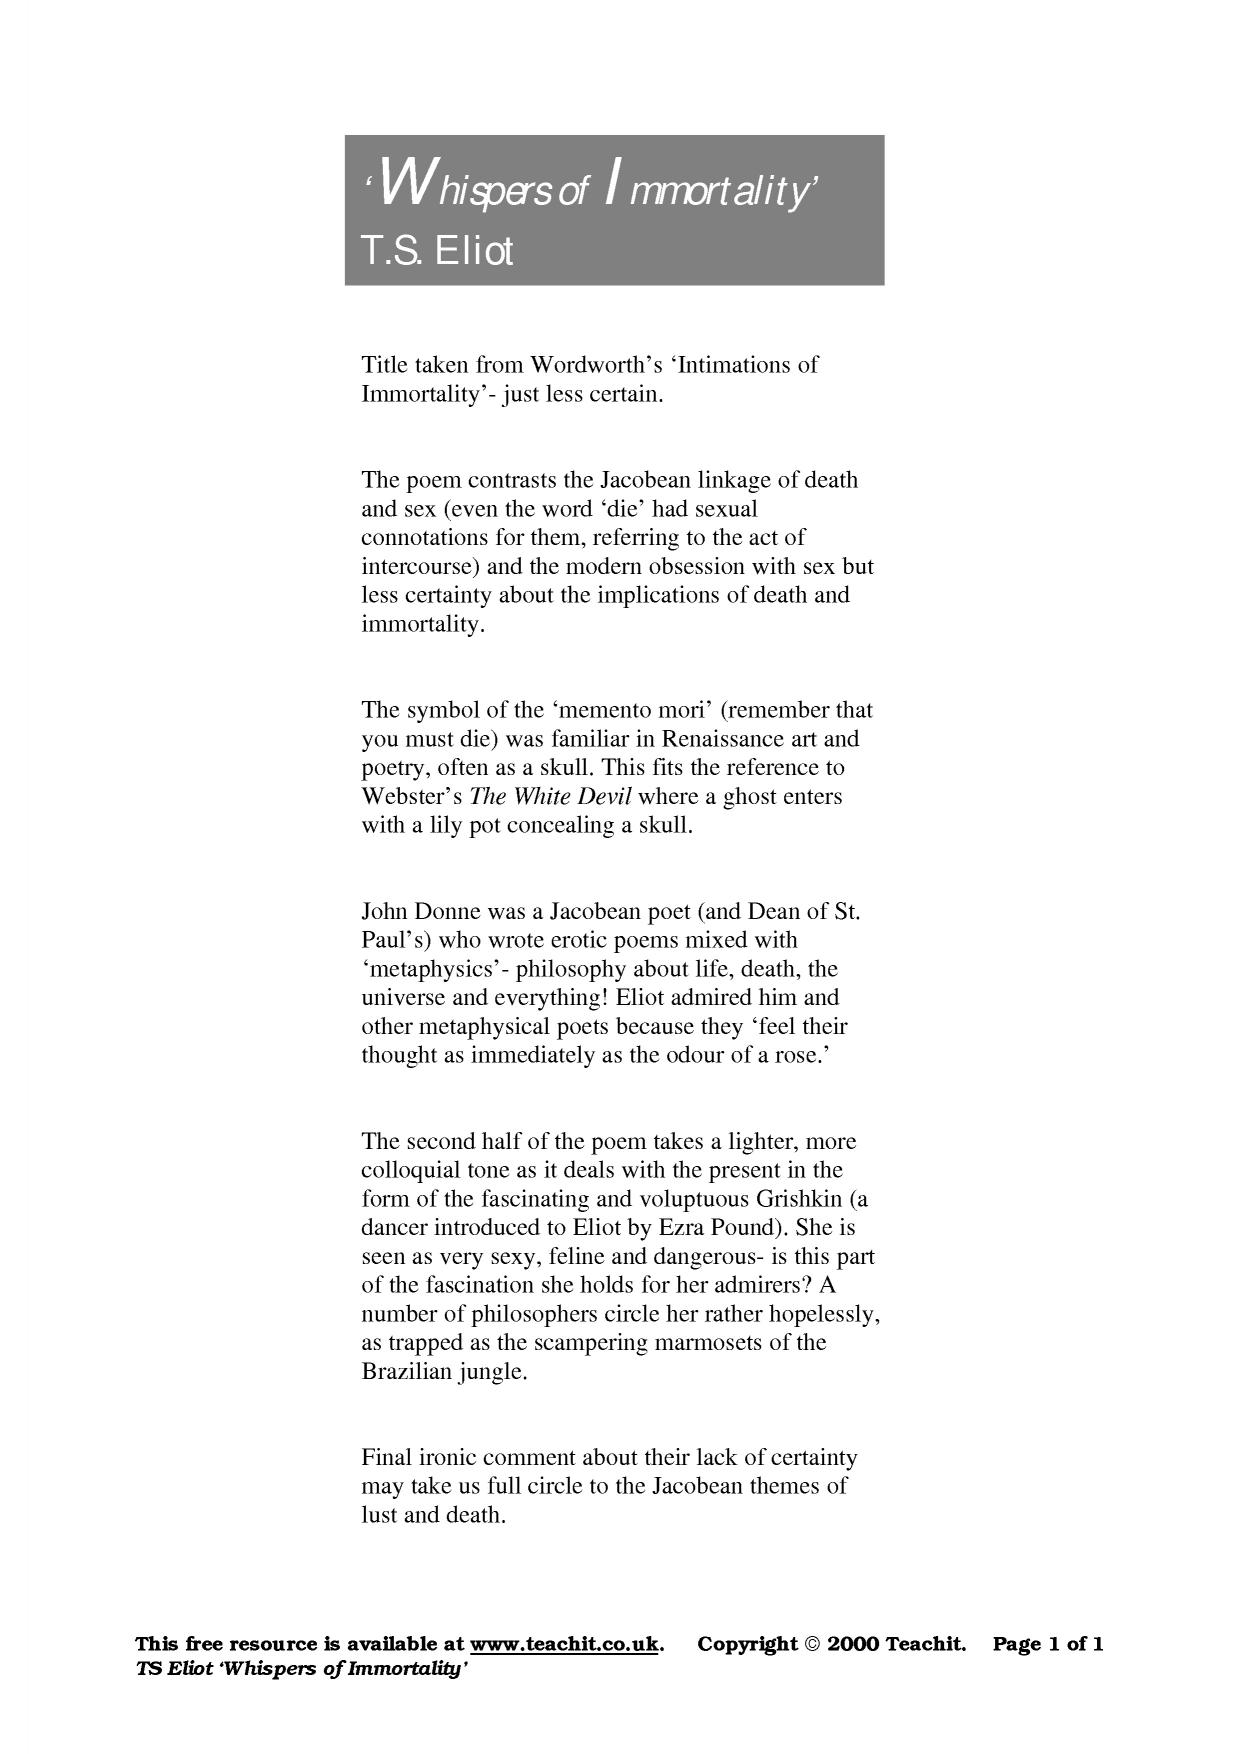 mementos poem pdf